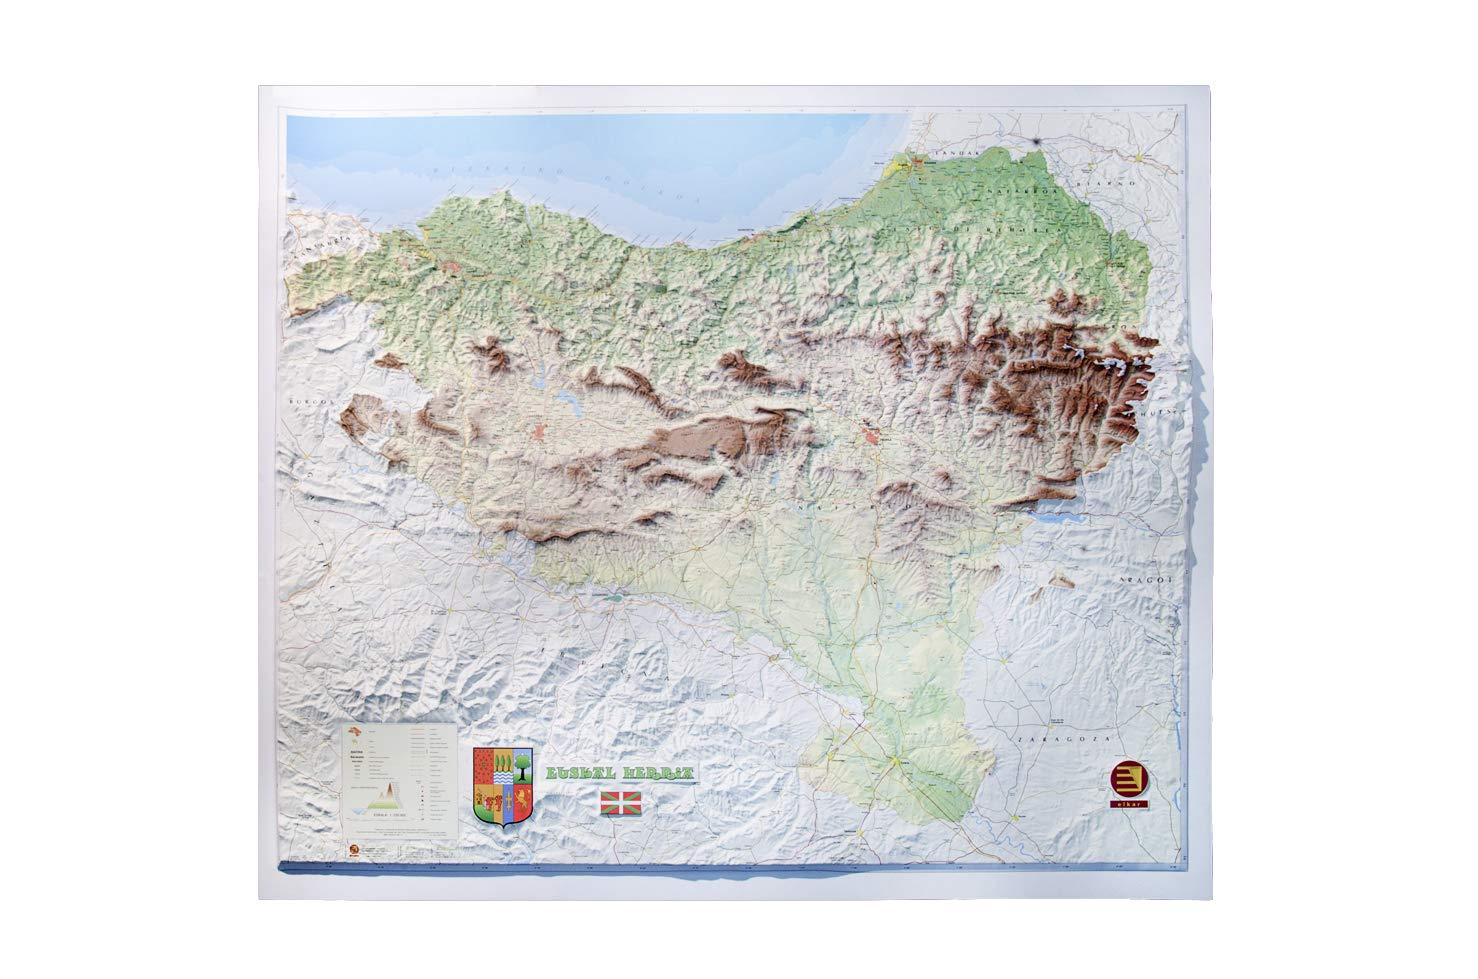 Mapa en relieve de Pais Vasco - Euskal Herria: Escala 1:230.000: Amazon.es: All 3D Form, S.L.: Libros